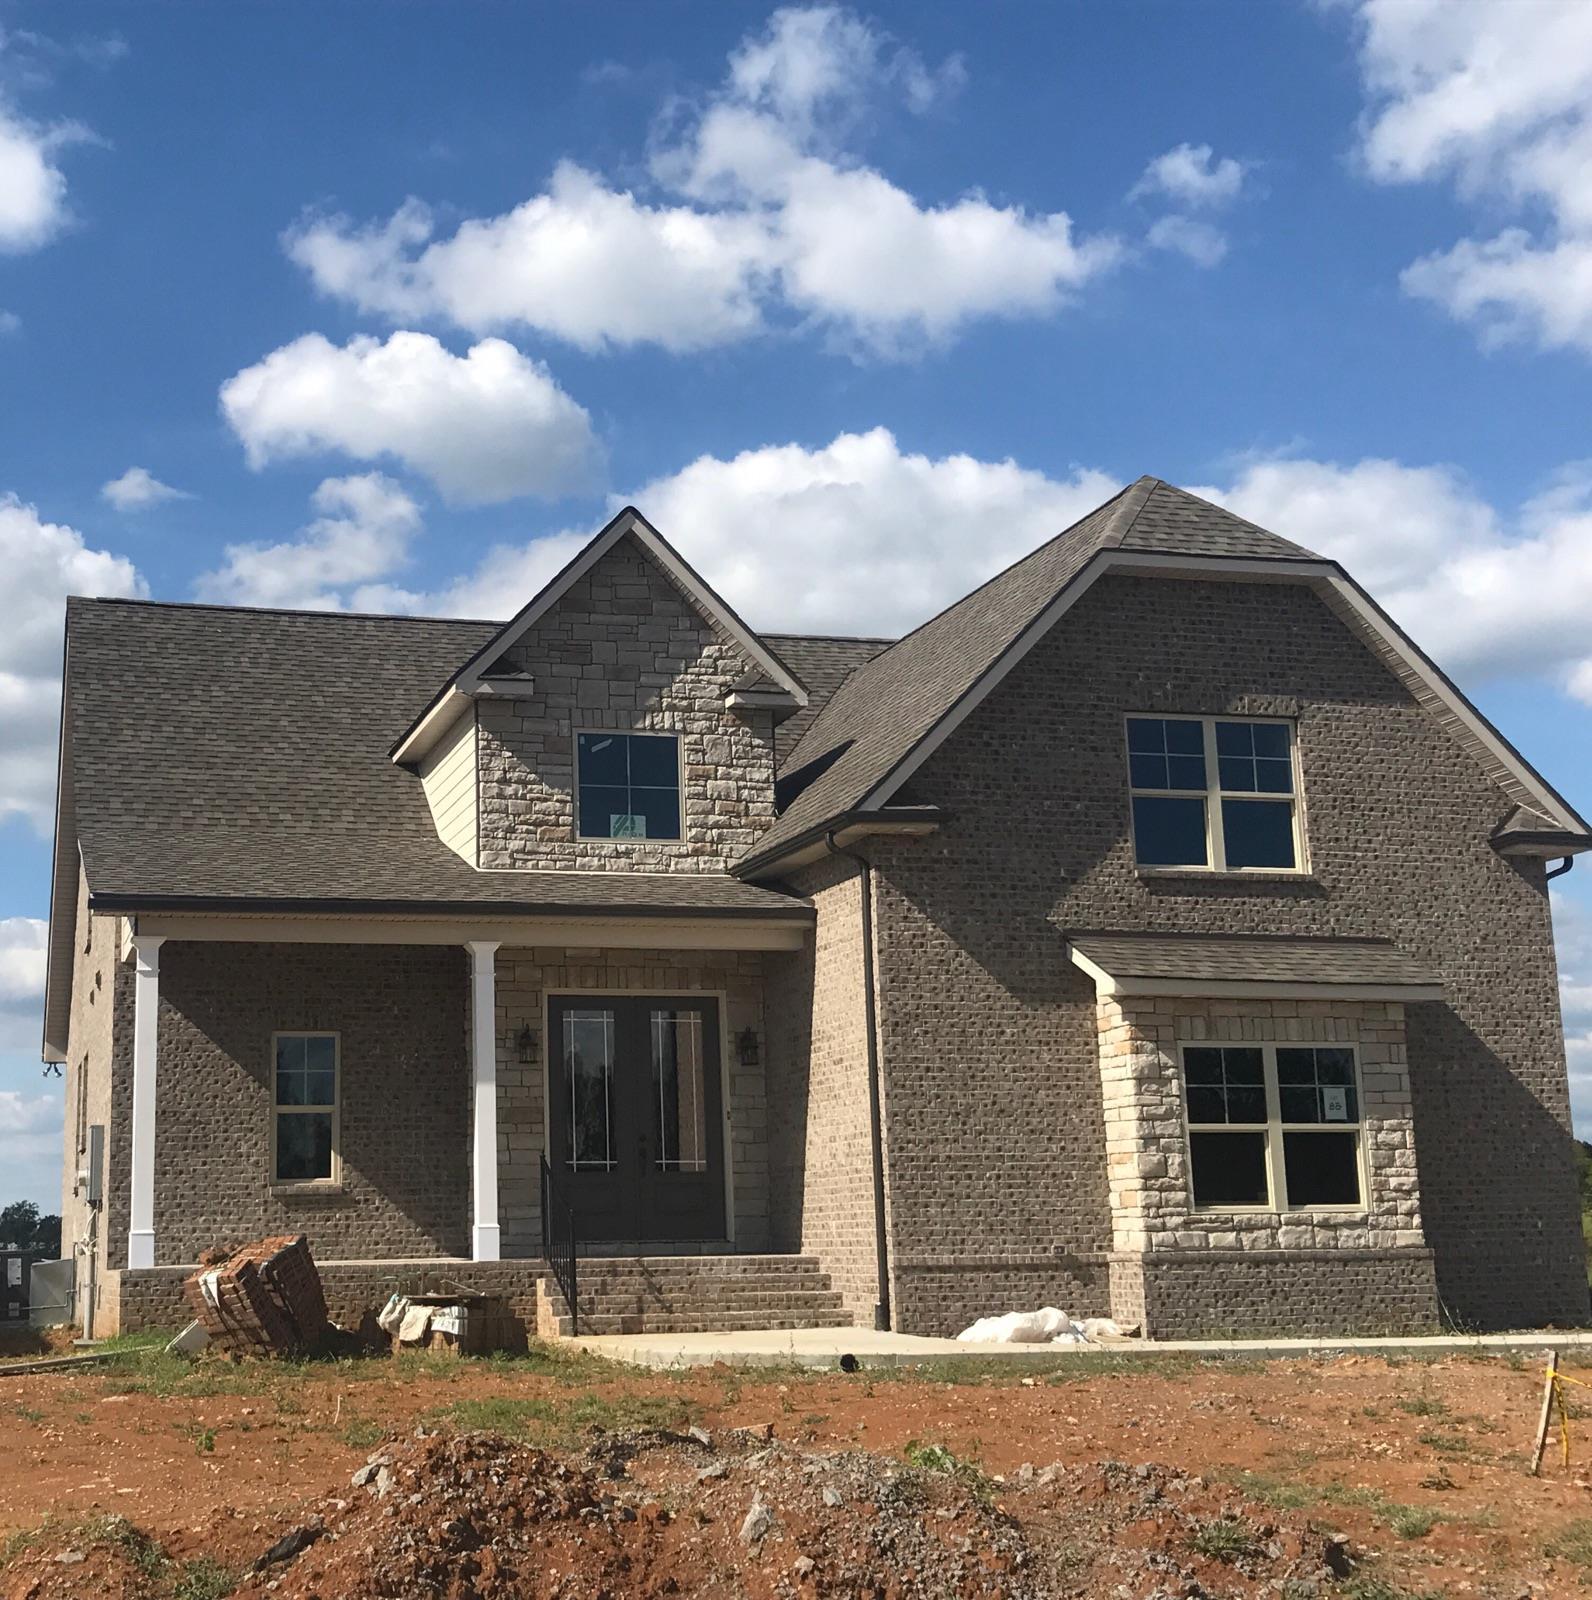 Photo of 4025 Merryman Lane Lot 85  Murfreesboro  TN